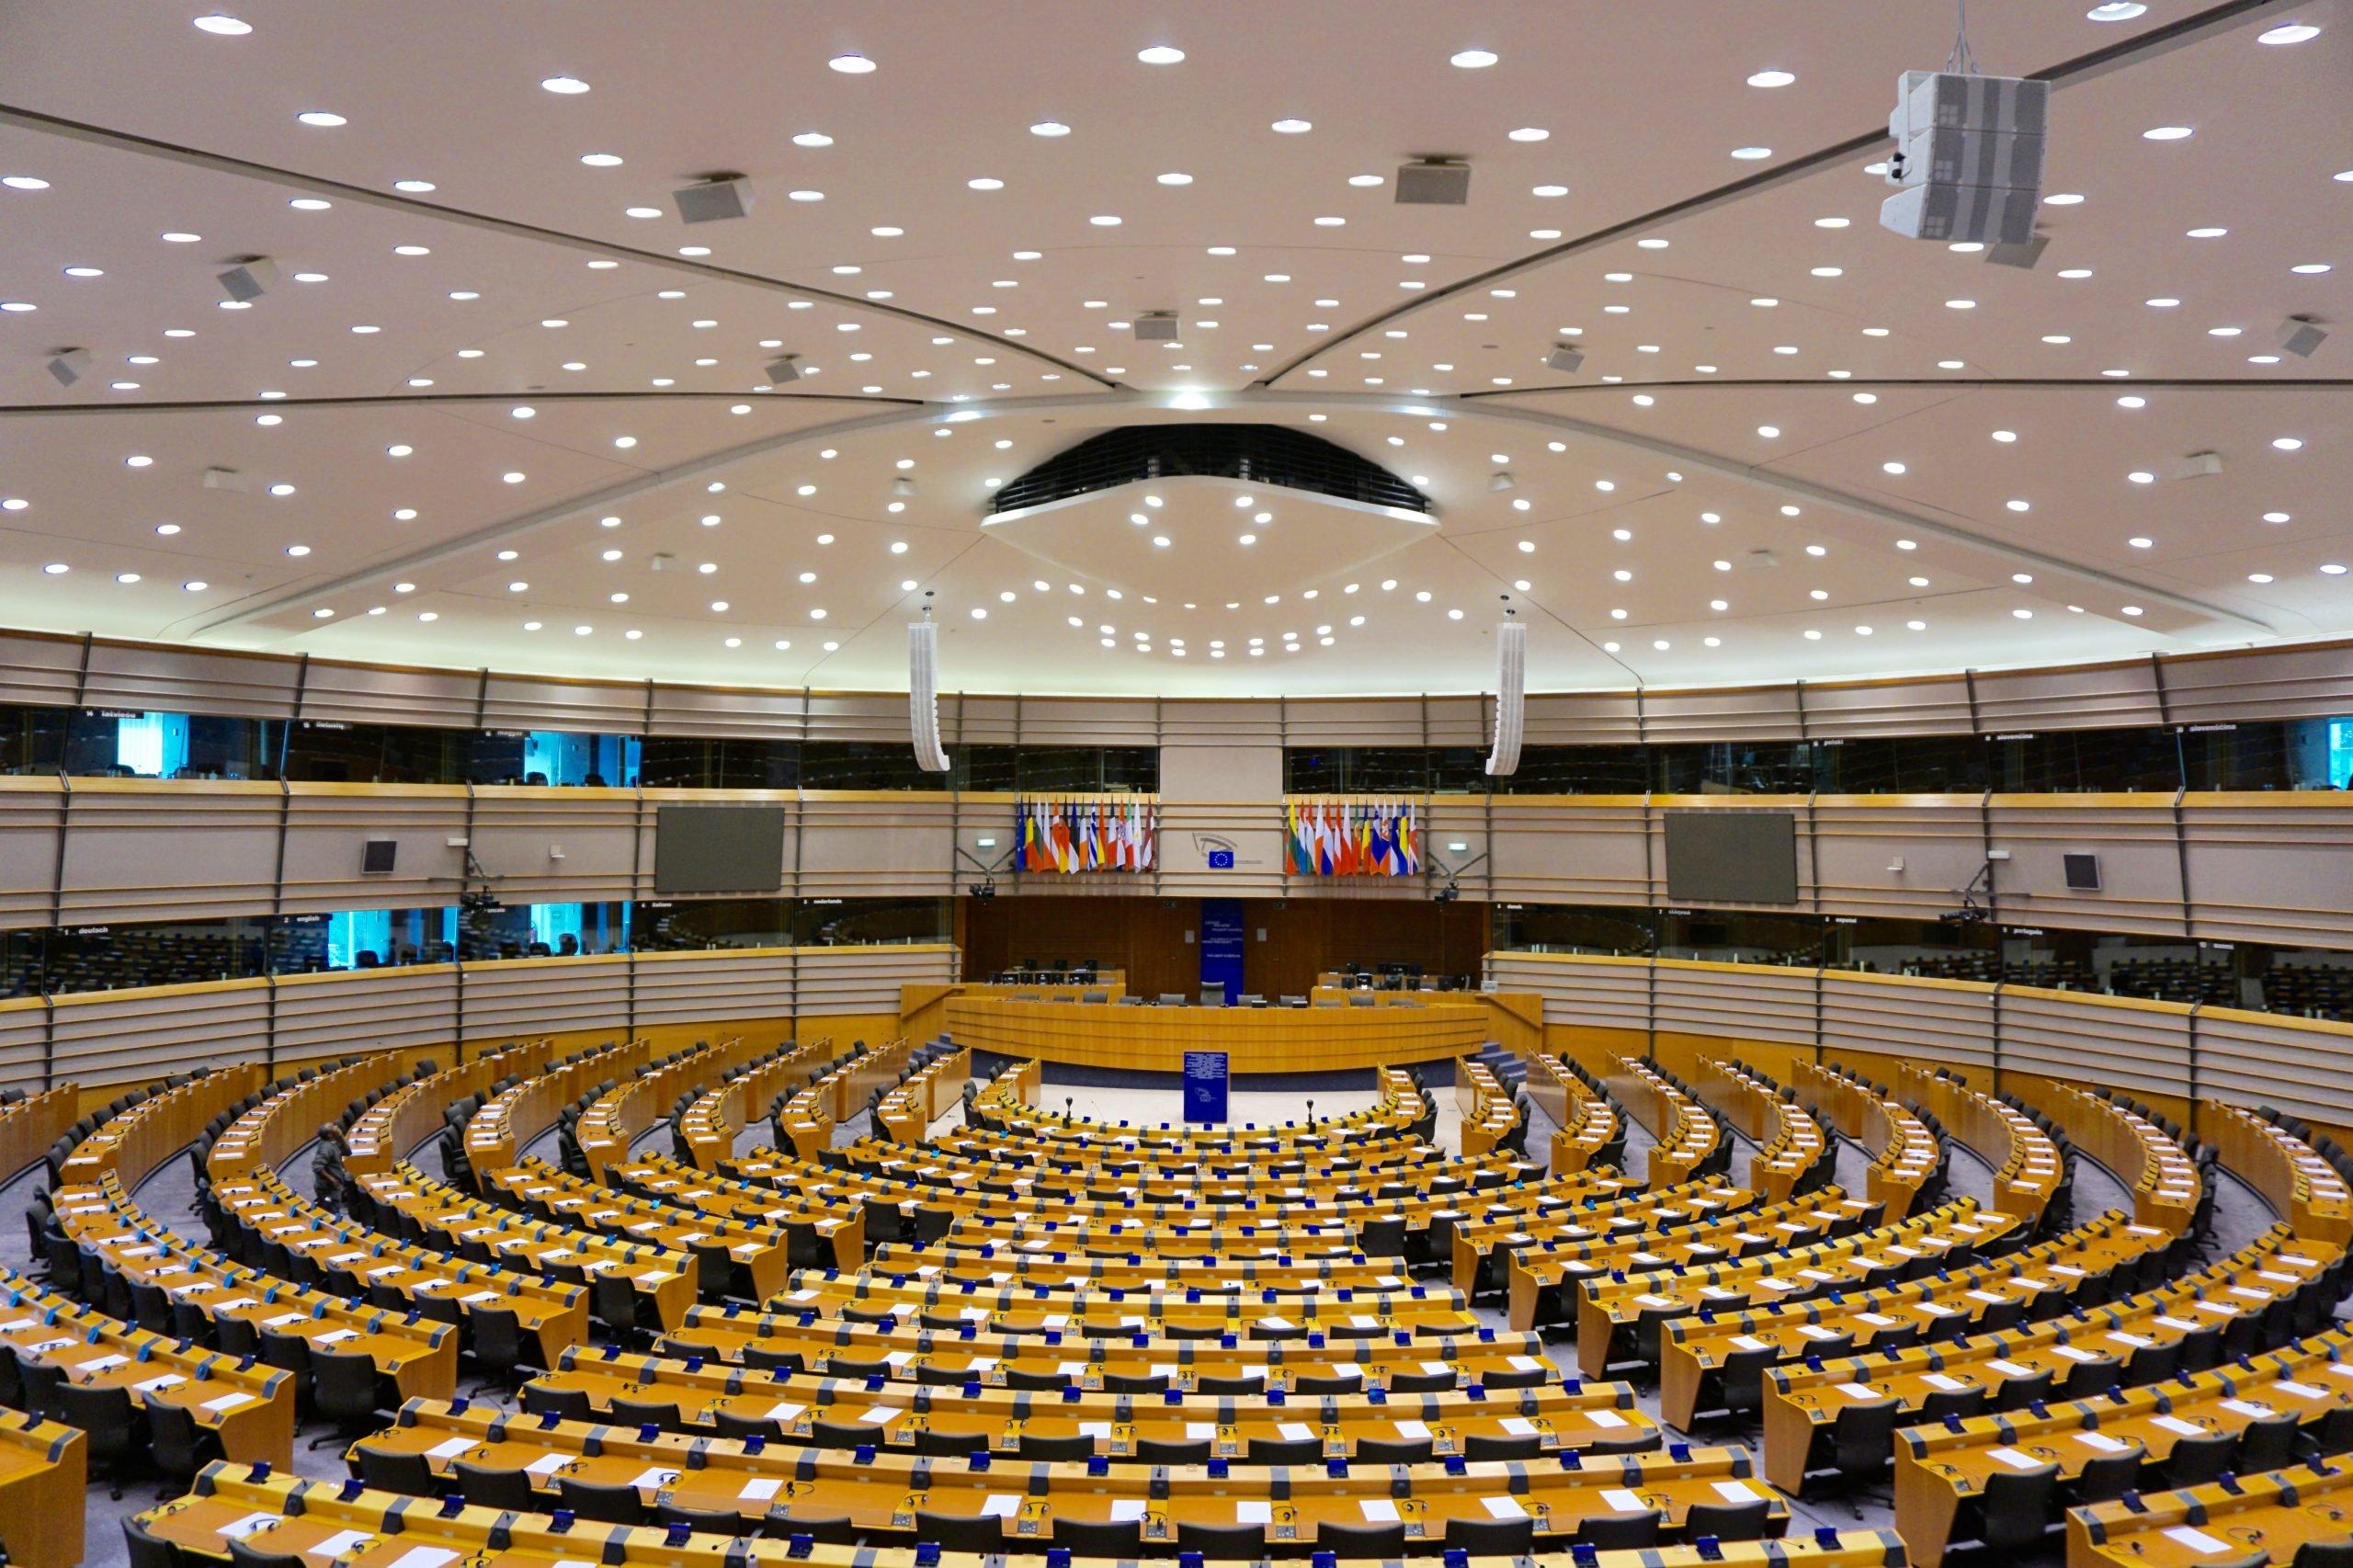 auditorium building europe hall brussels parliament 743555 pxhere.com  scaled 1